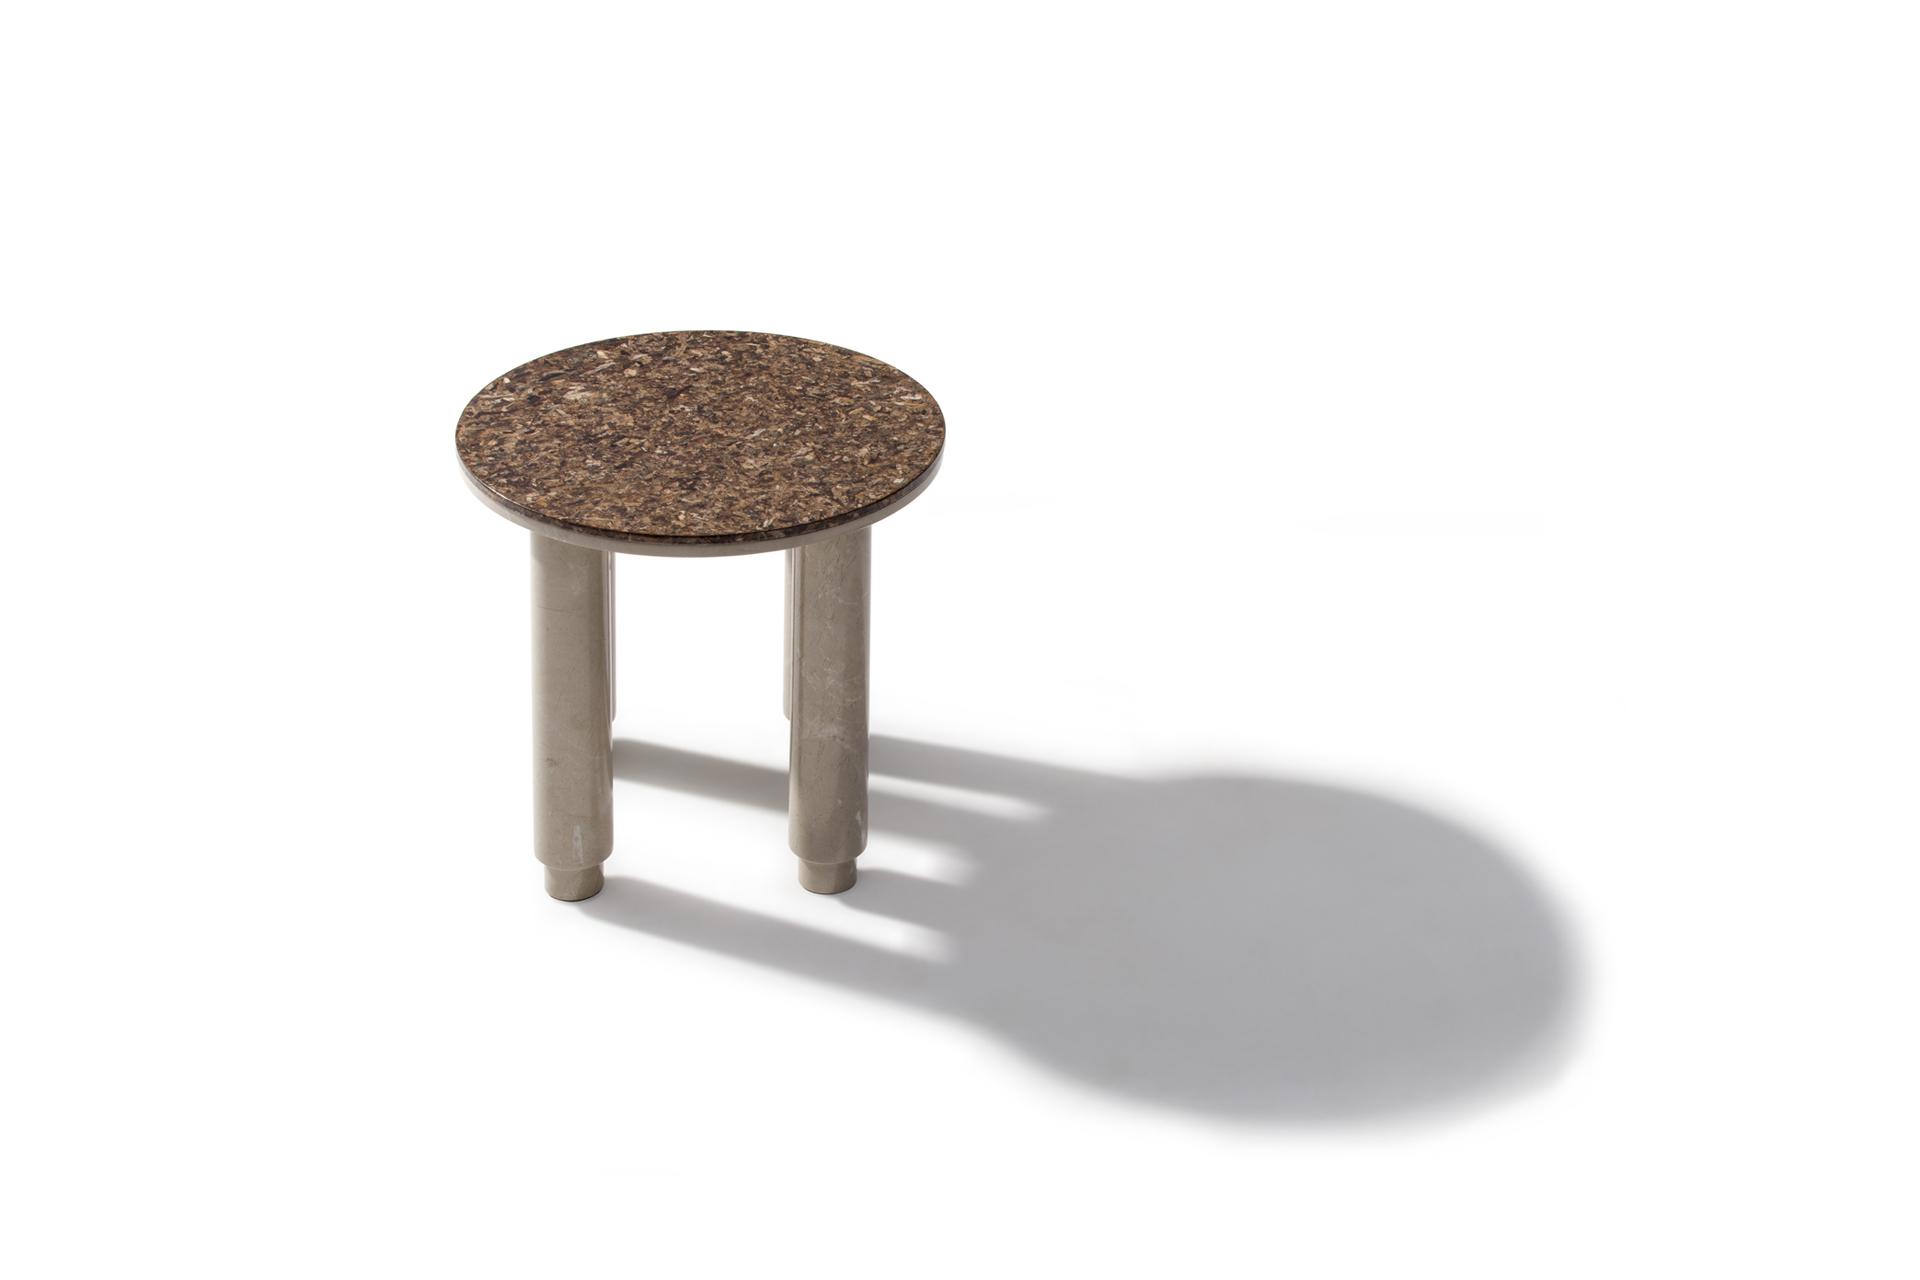 Tethys round table